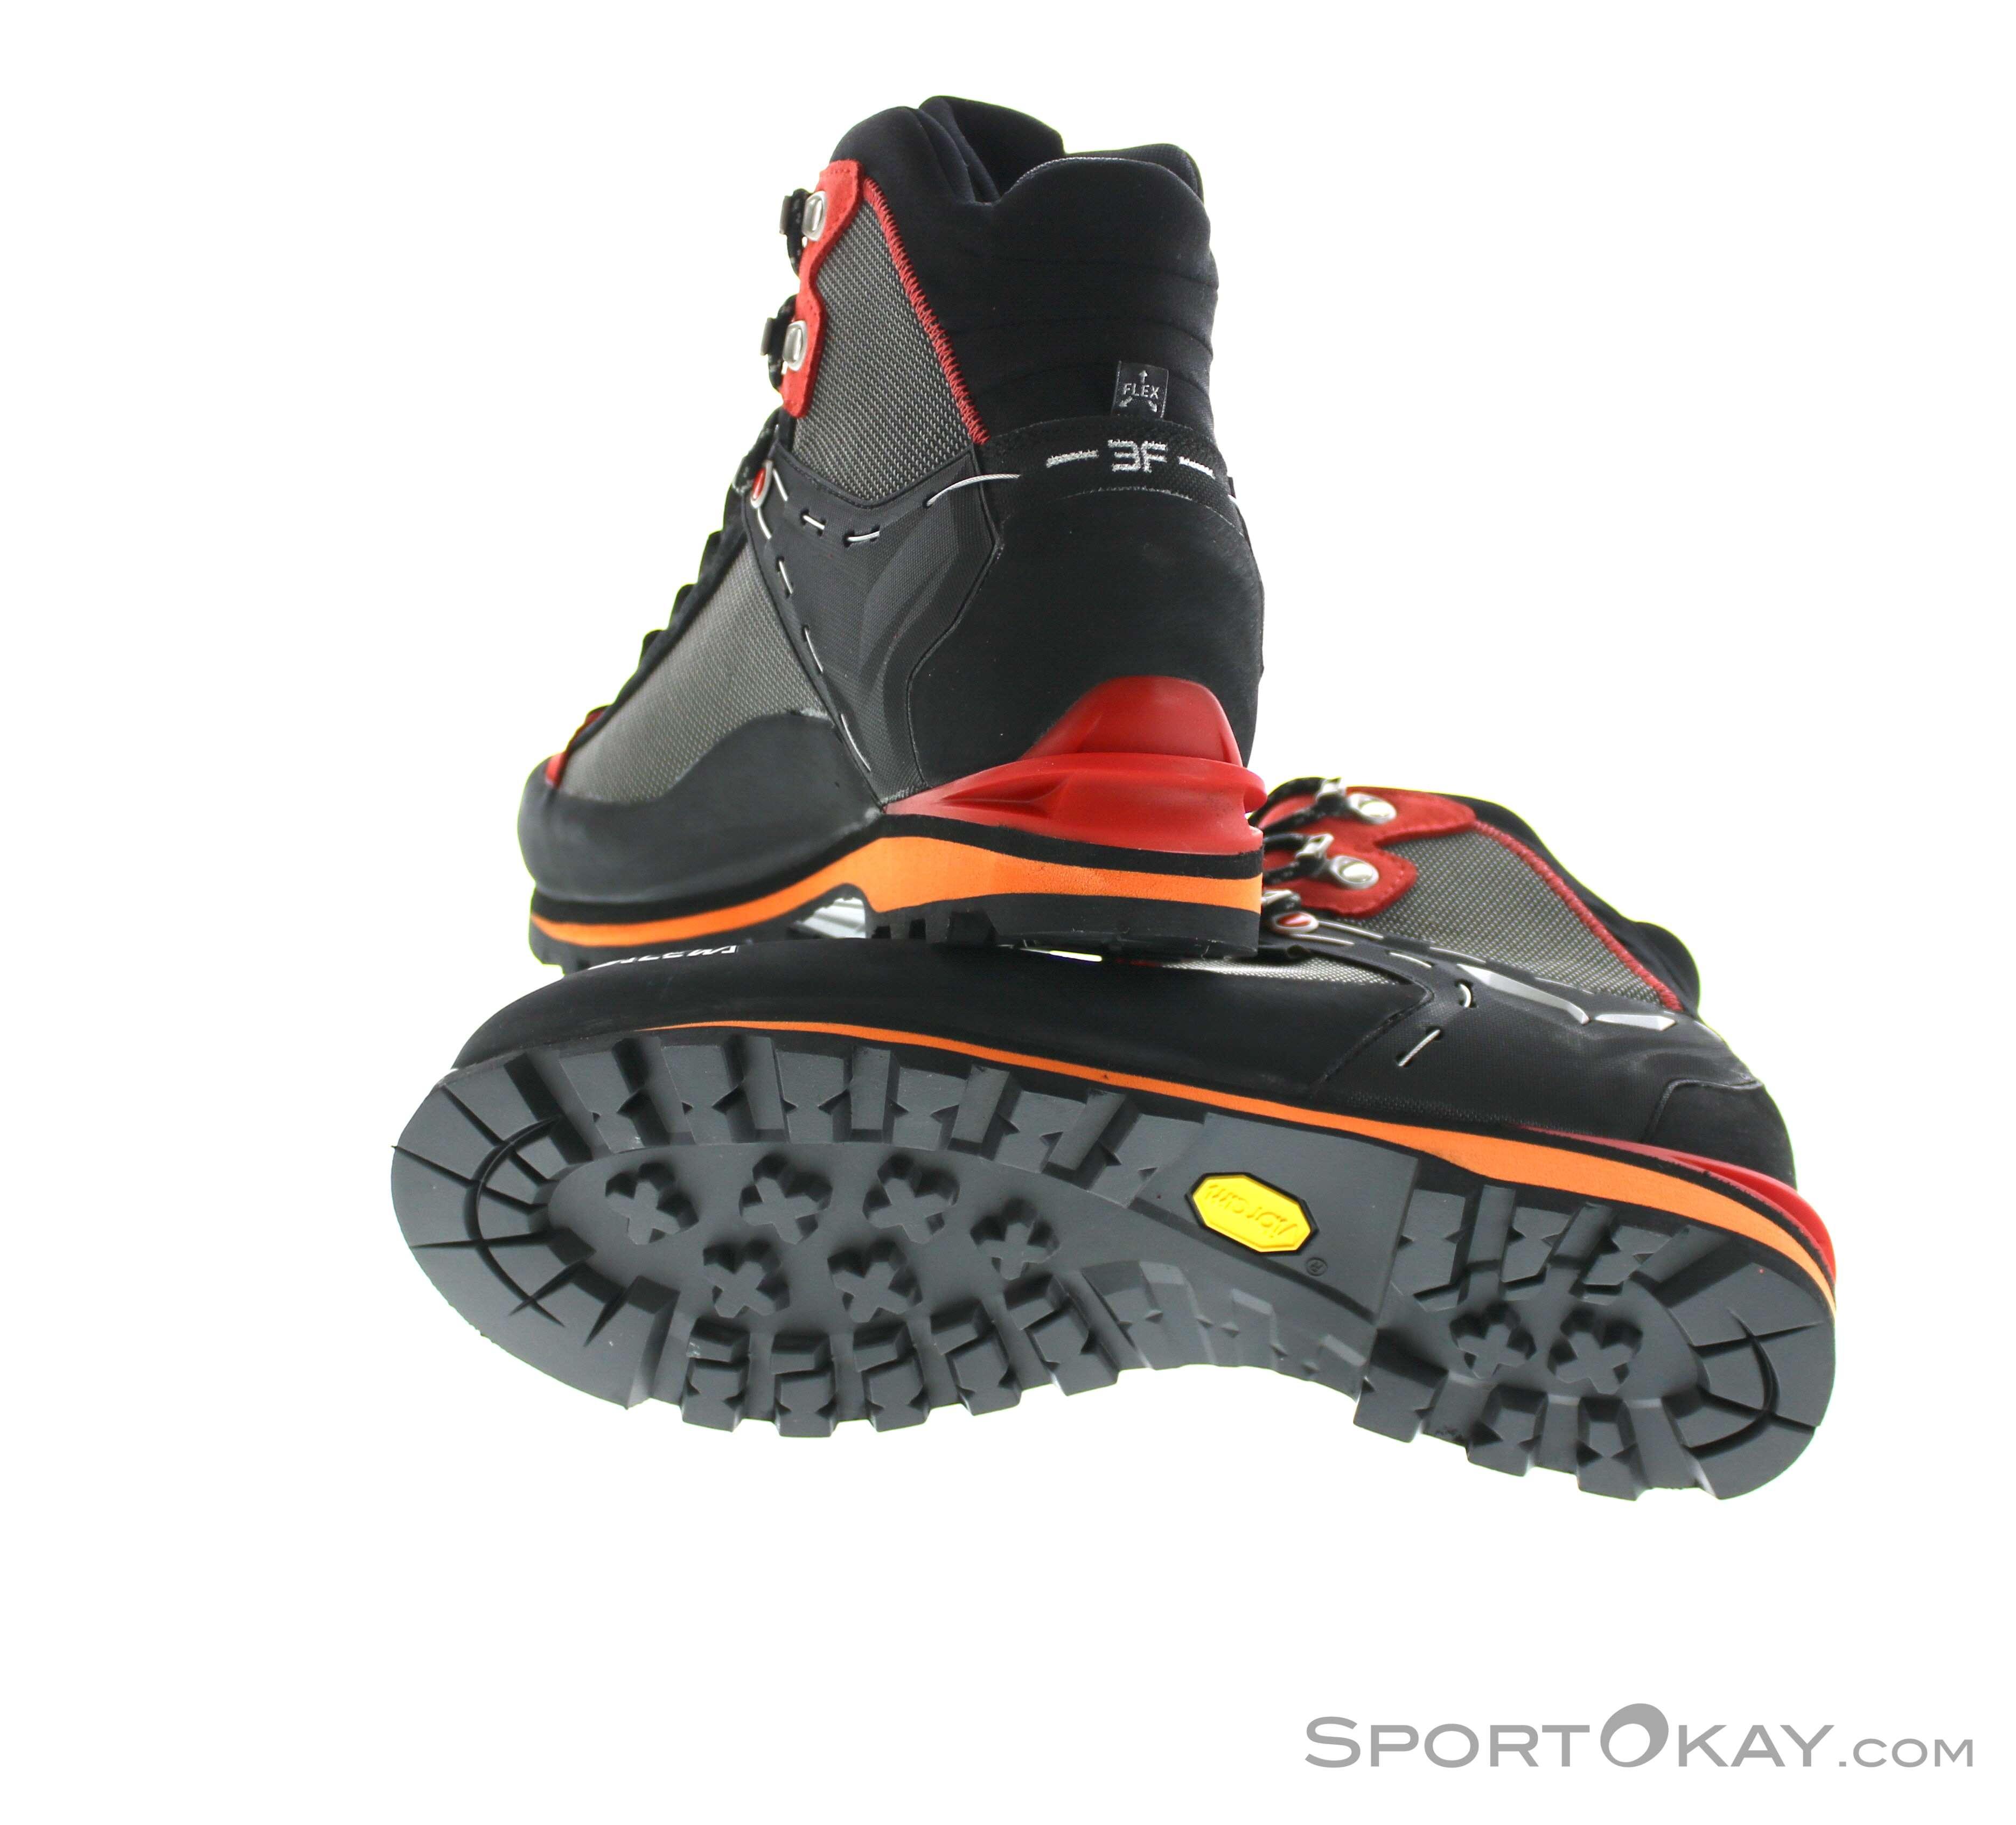 Salewa Salewa Crow GTX Mens Mountaineering Boots Gore Tex